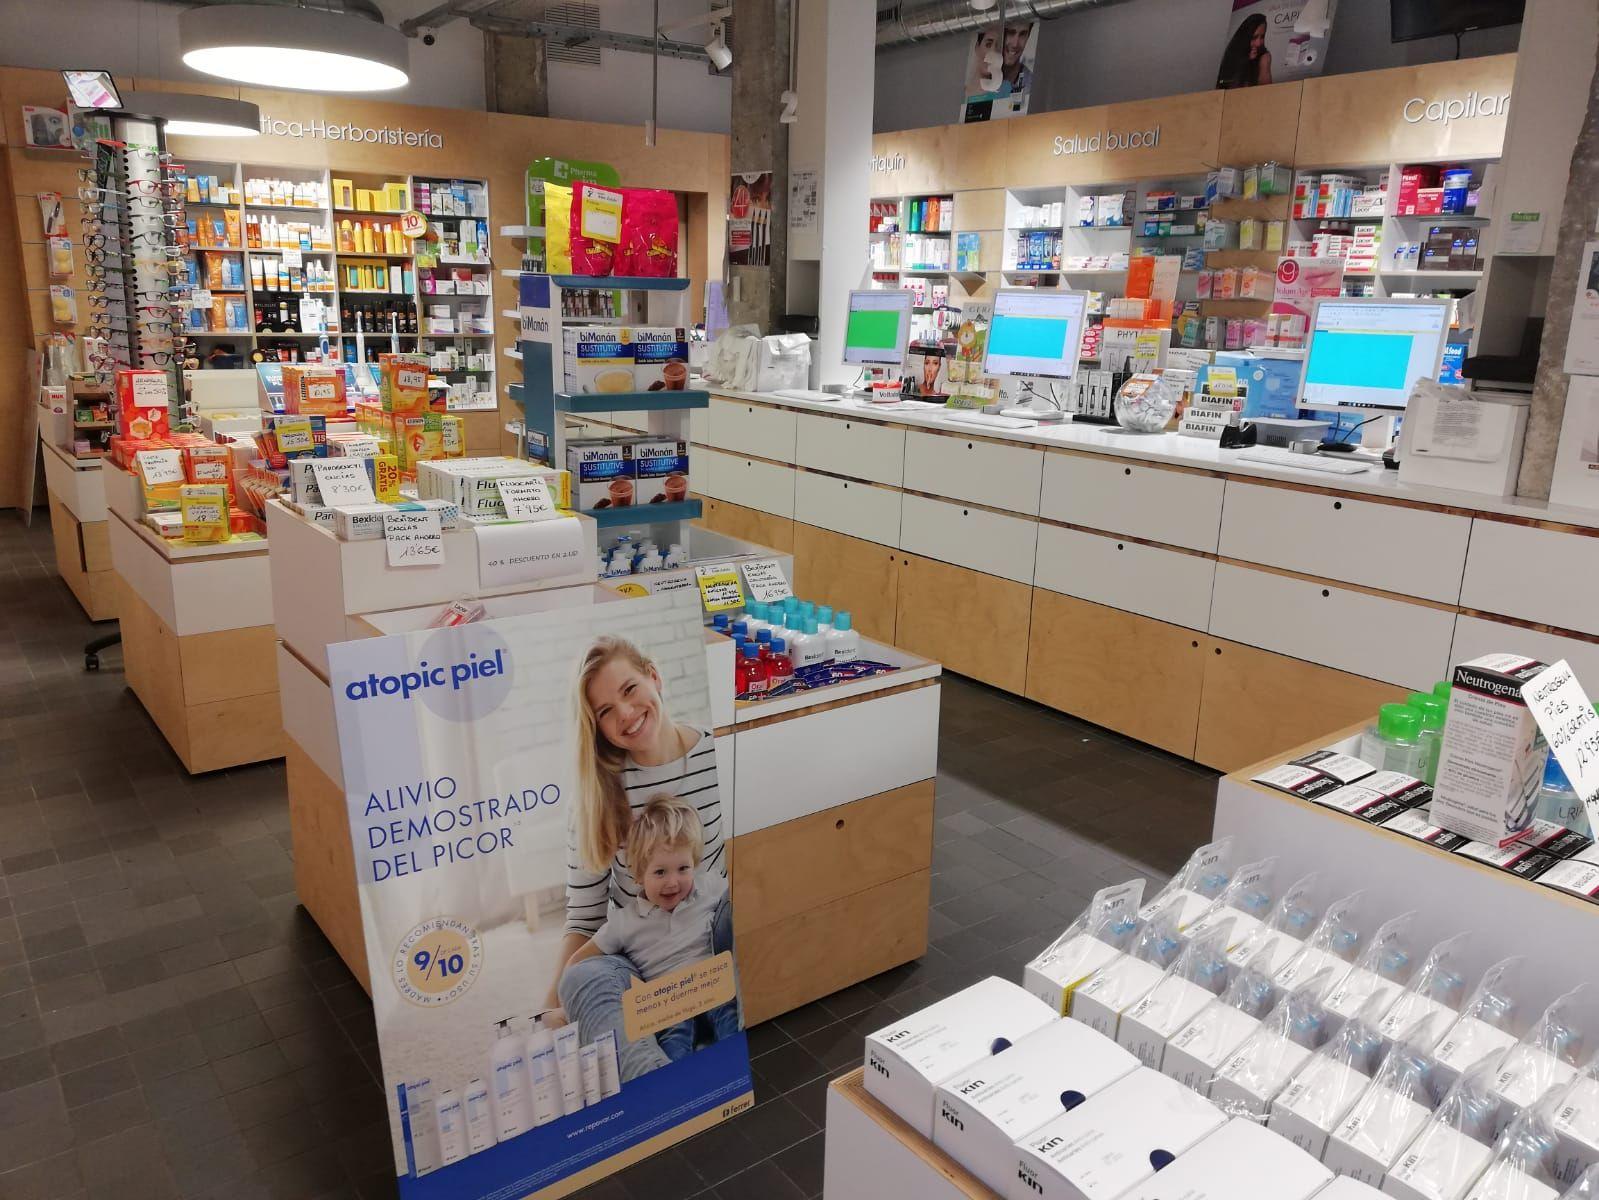 Farmacia con productos cosméticos en Barakaldo